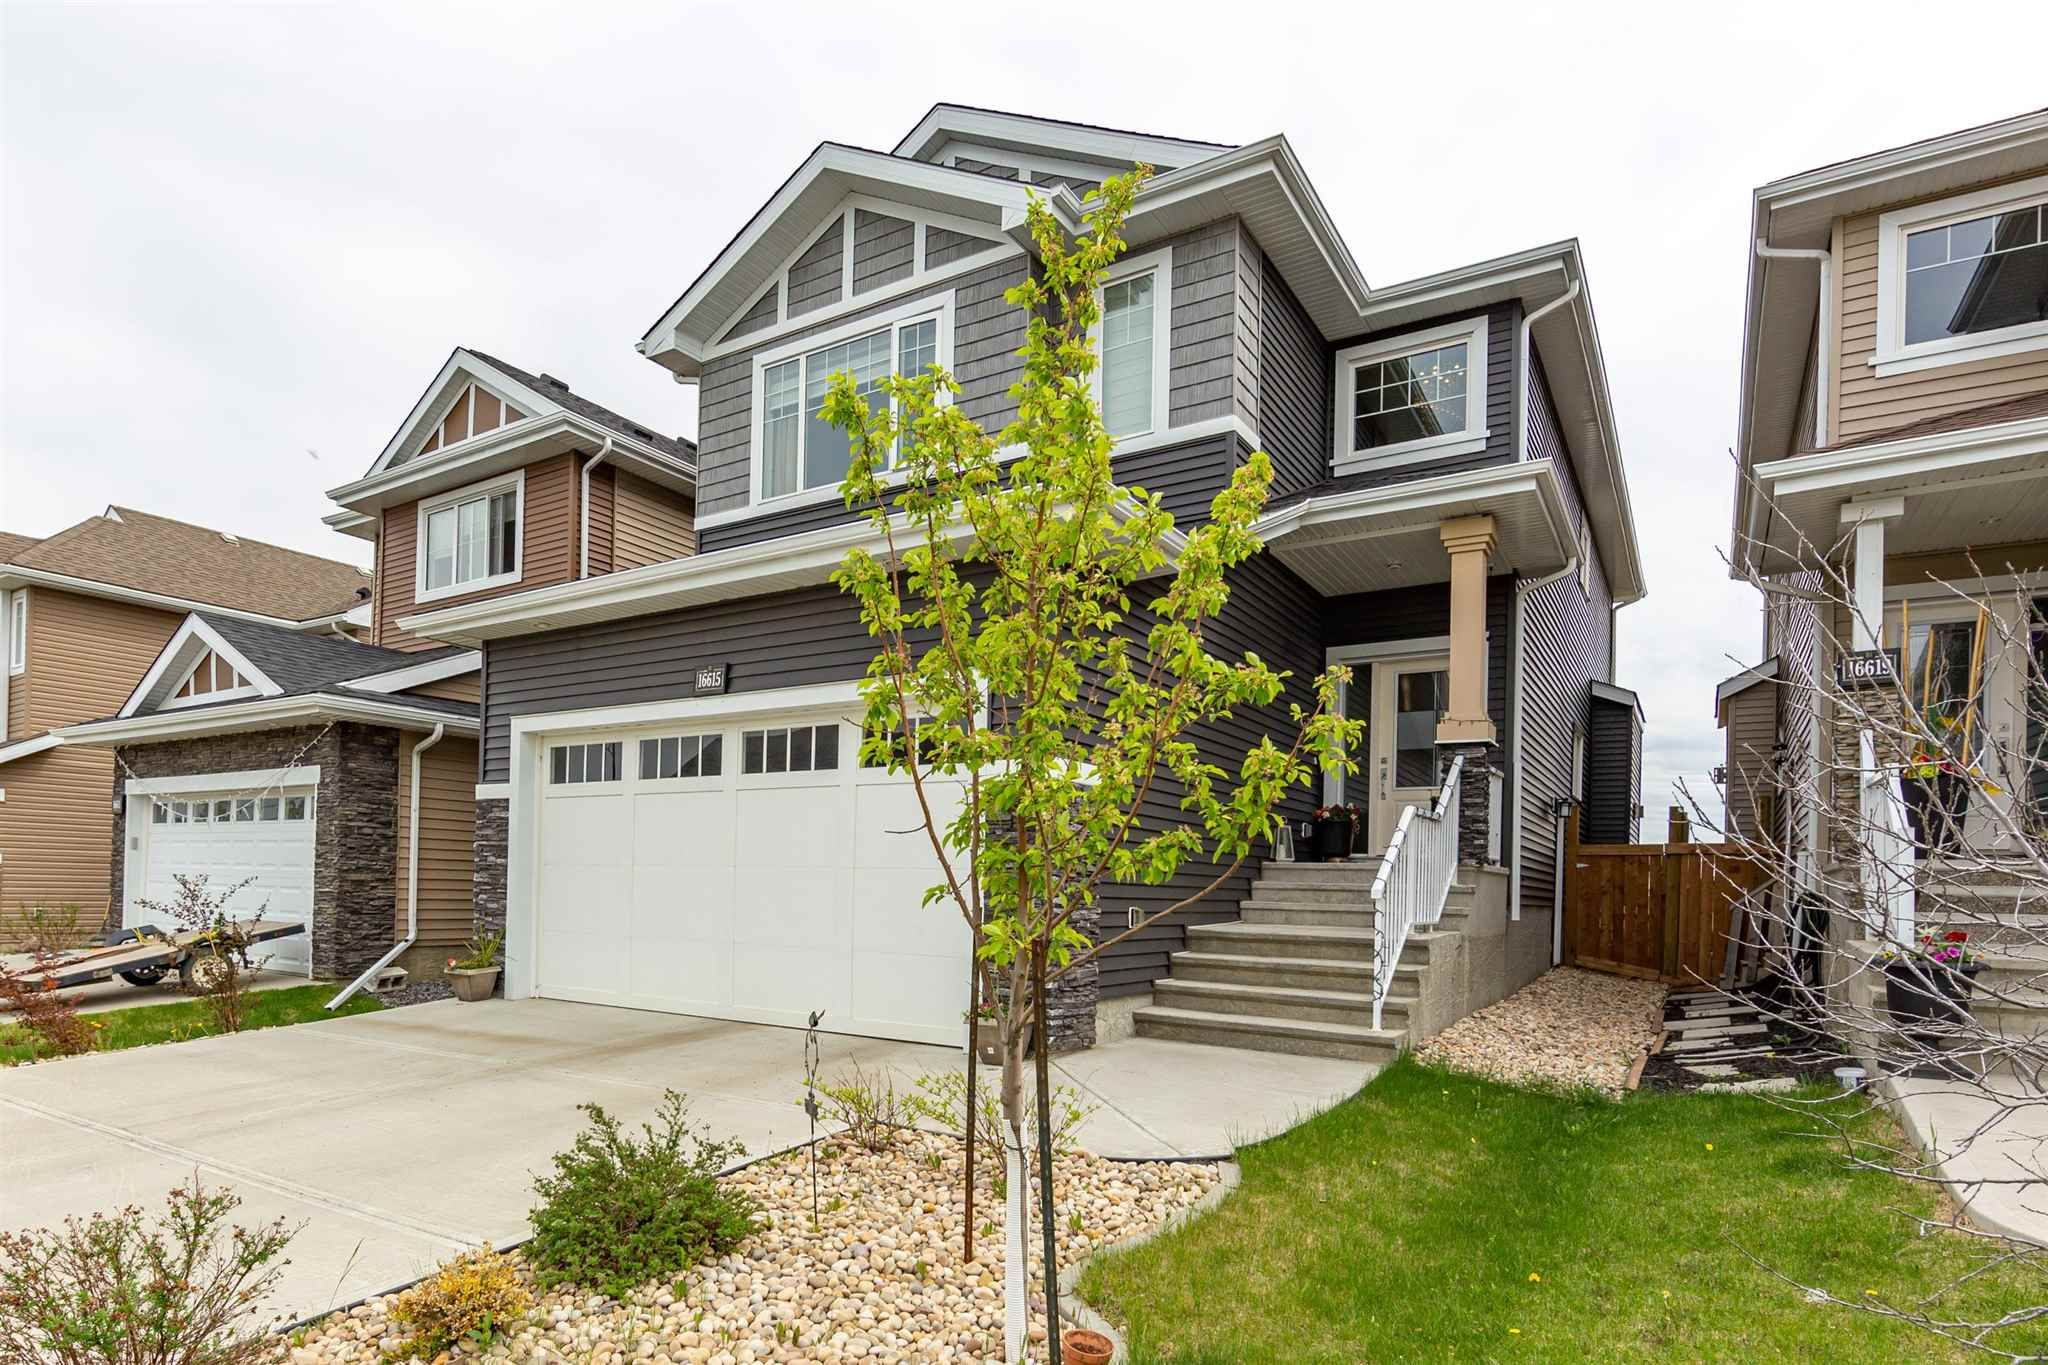 Main Photo: 16615 18 Avenue in Edmonton: Zone 56 House for sale : MLS®# E4246800